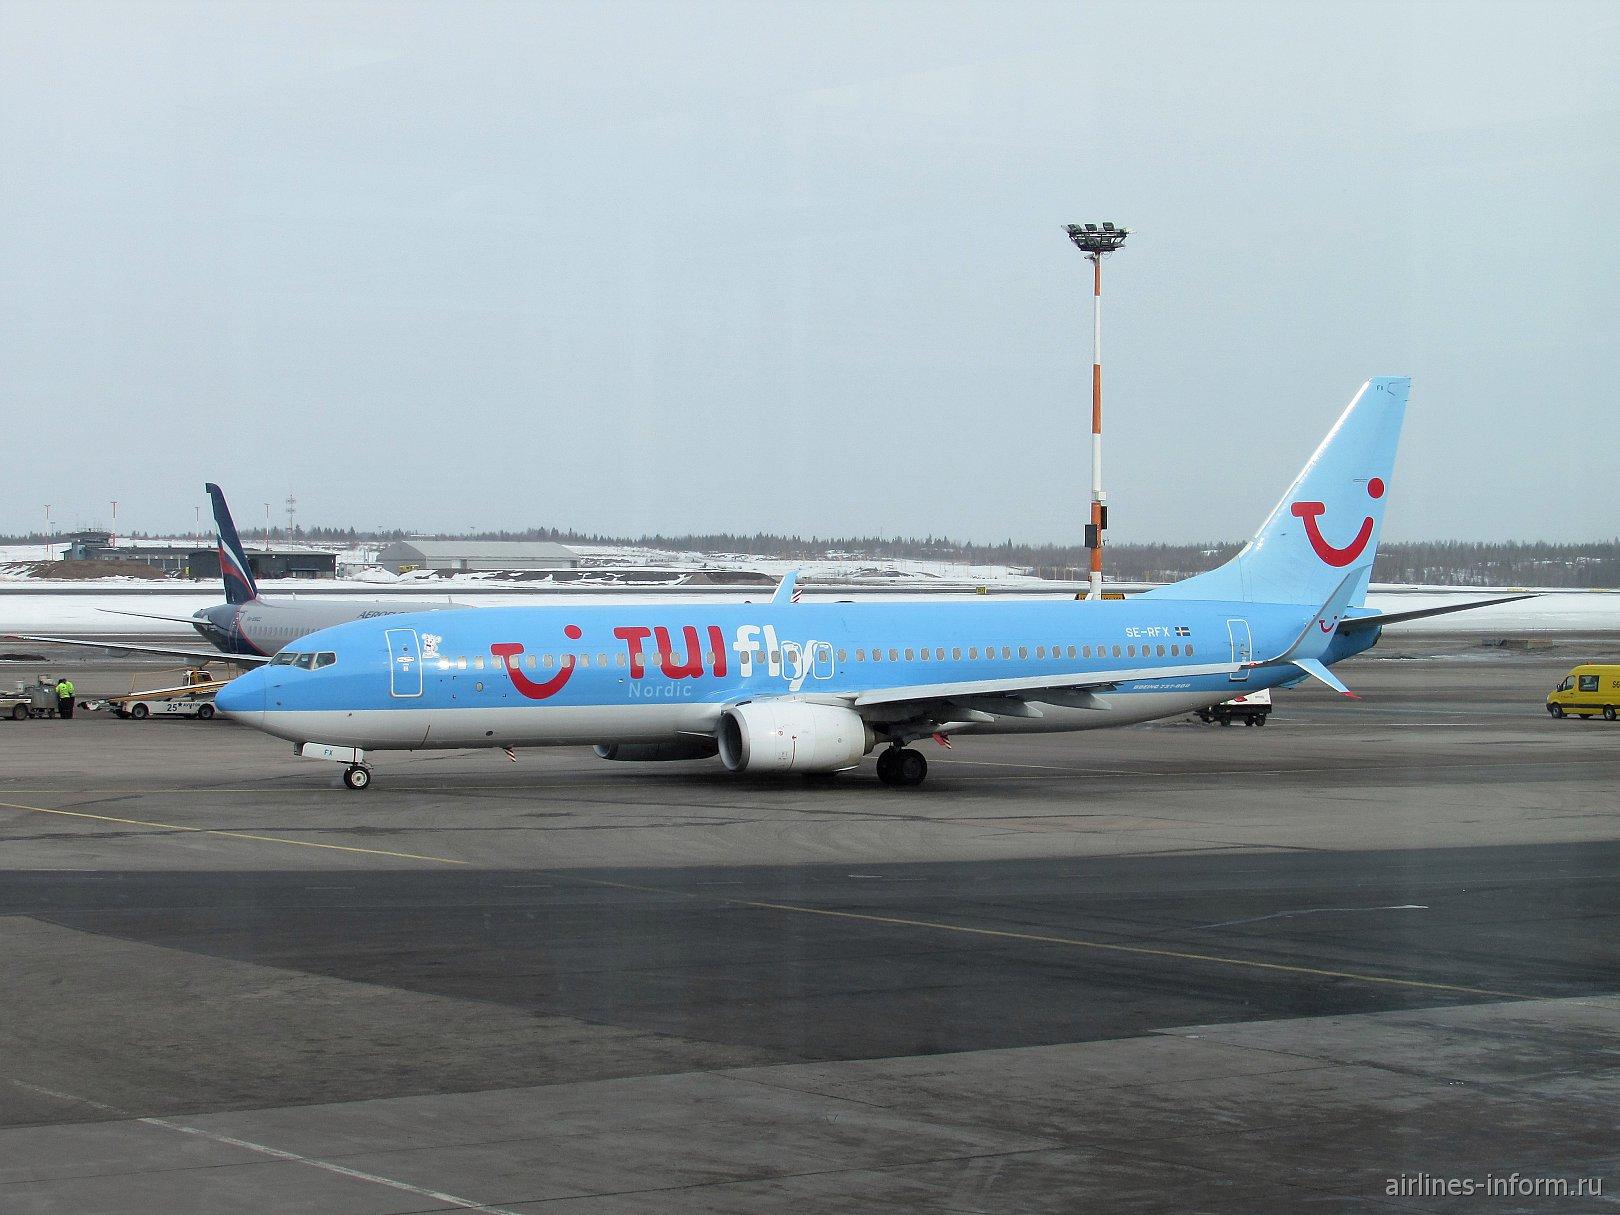 Боинг-737-800 SE-RFX авиакомпании TUIfly Nordic в аэропорту Хельсинки Вантаа